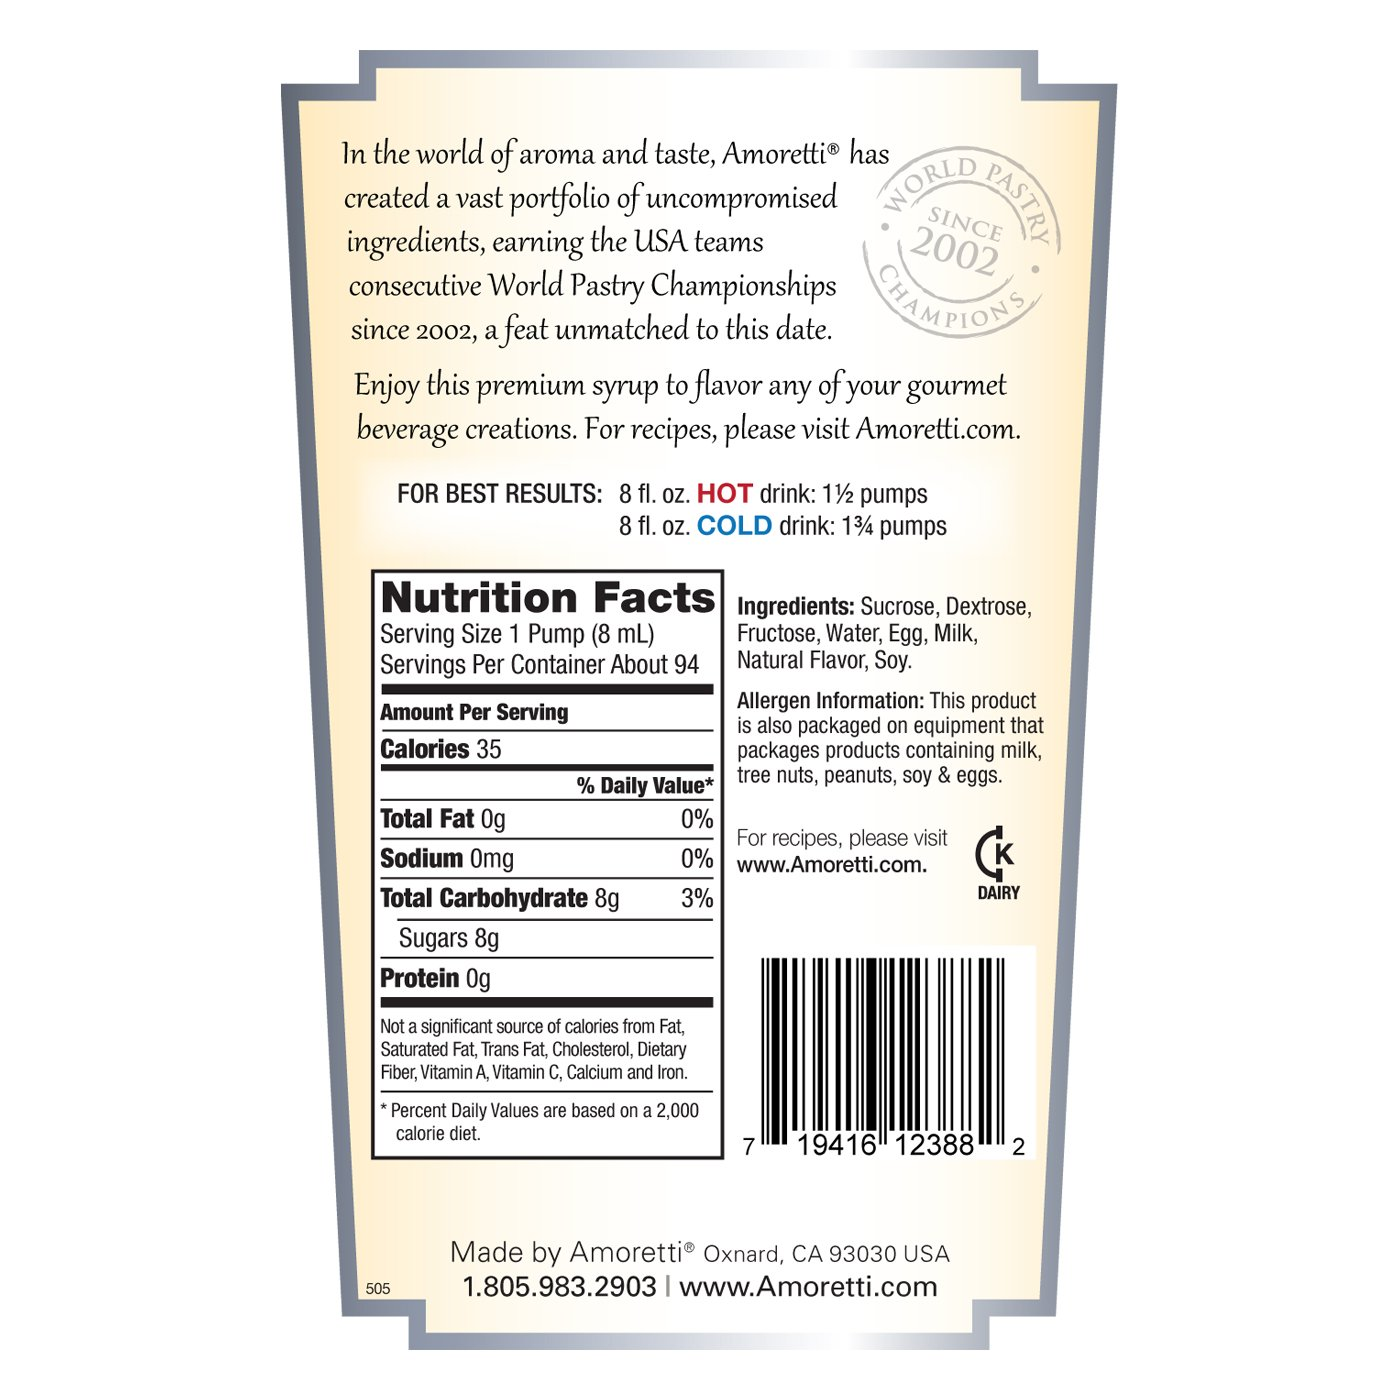 Amoretti Premium Syrup, Eggnog, 25.4 Ounce by Amoretti (Image #2)